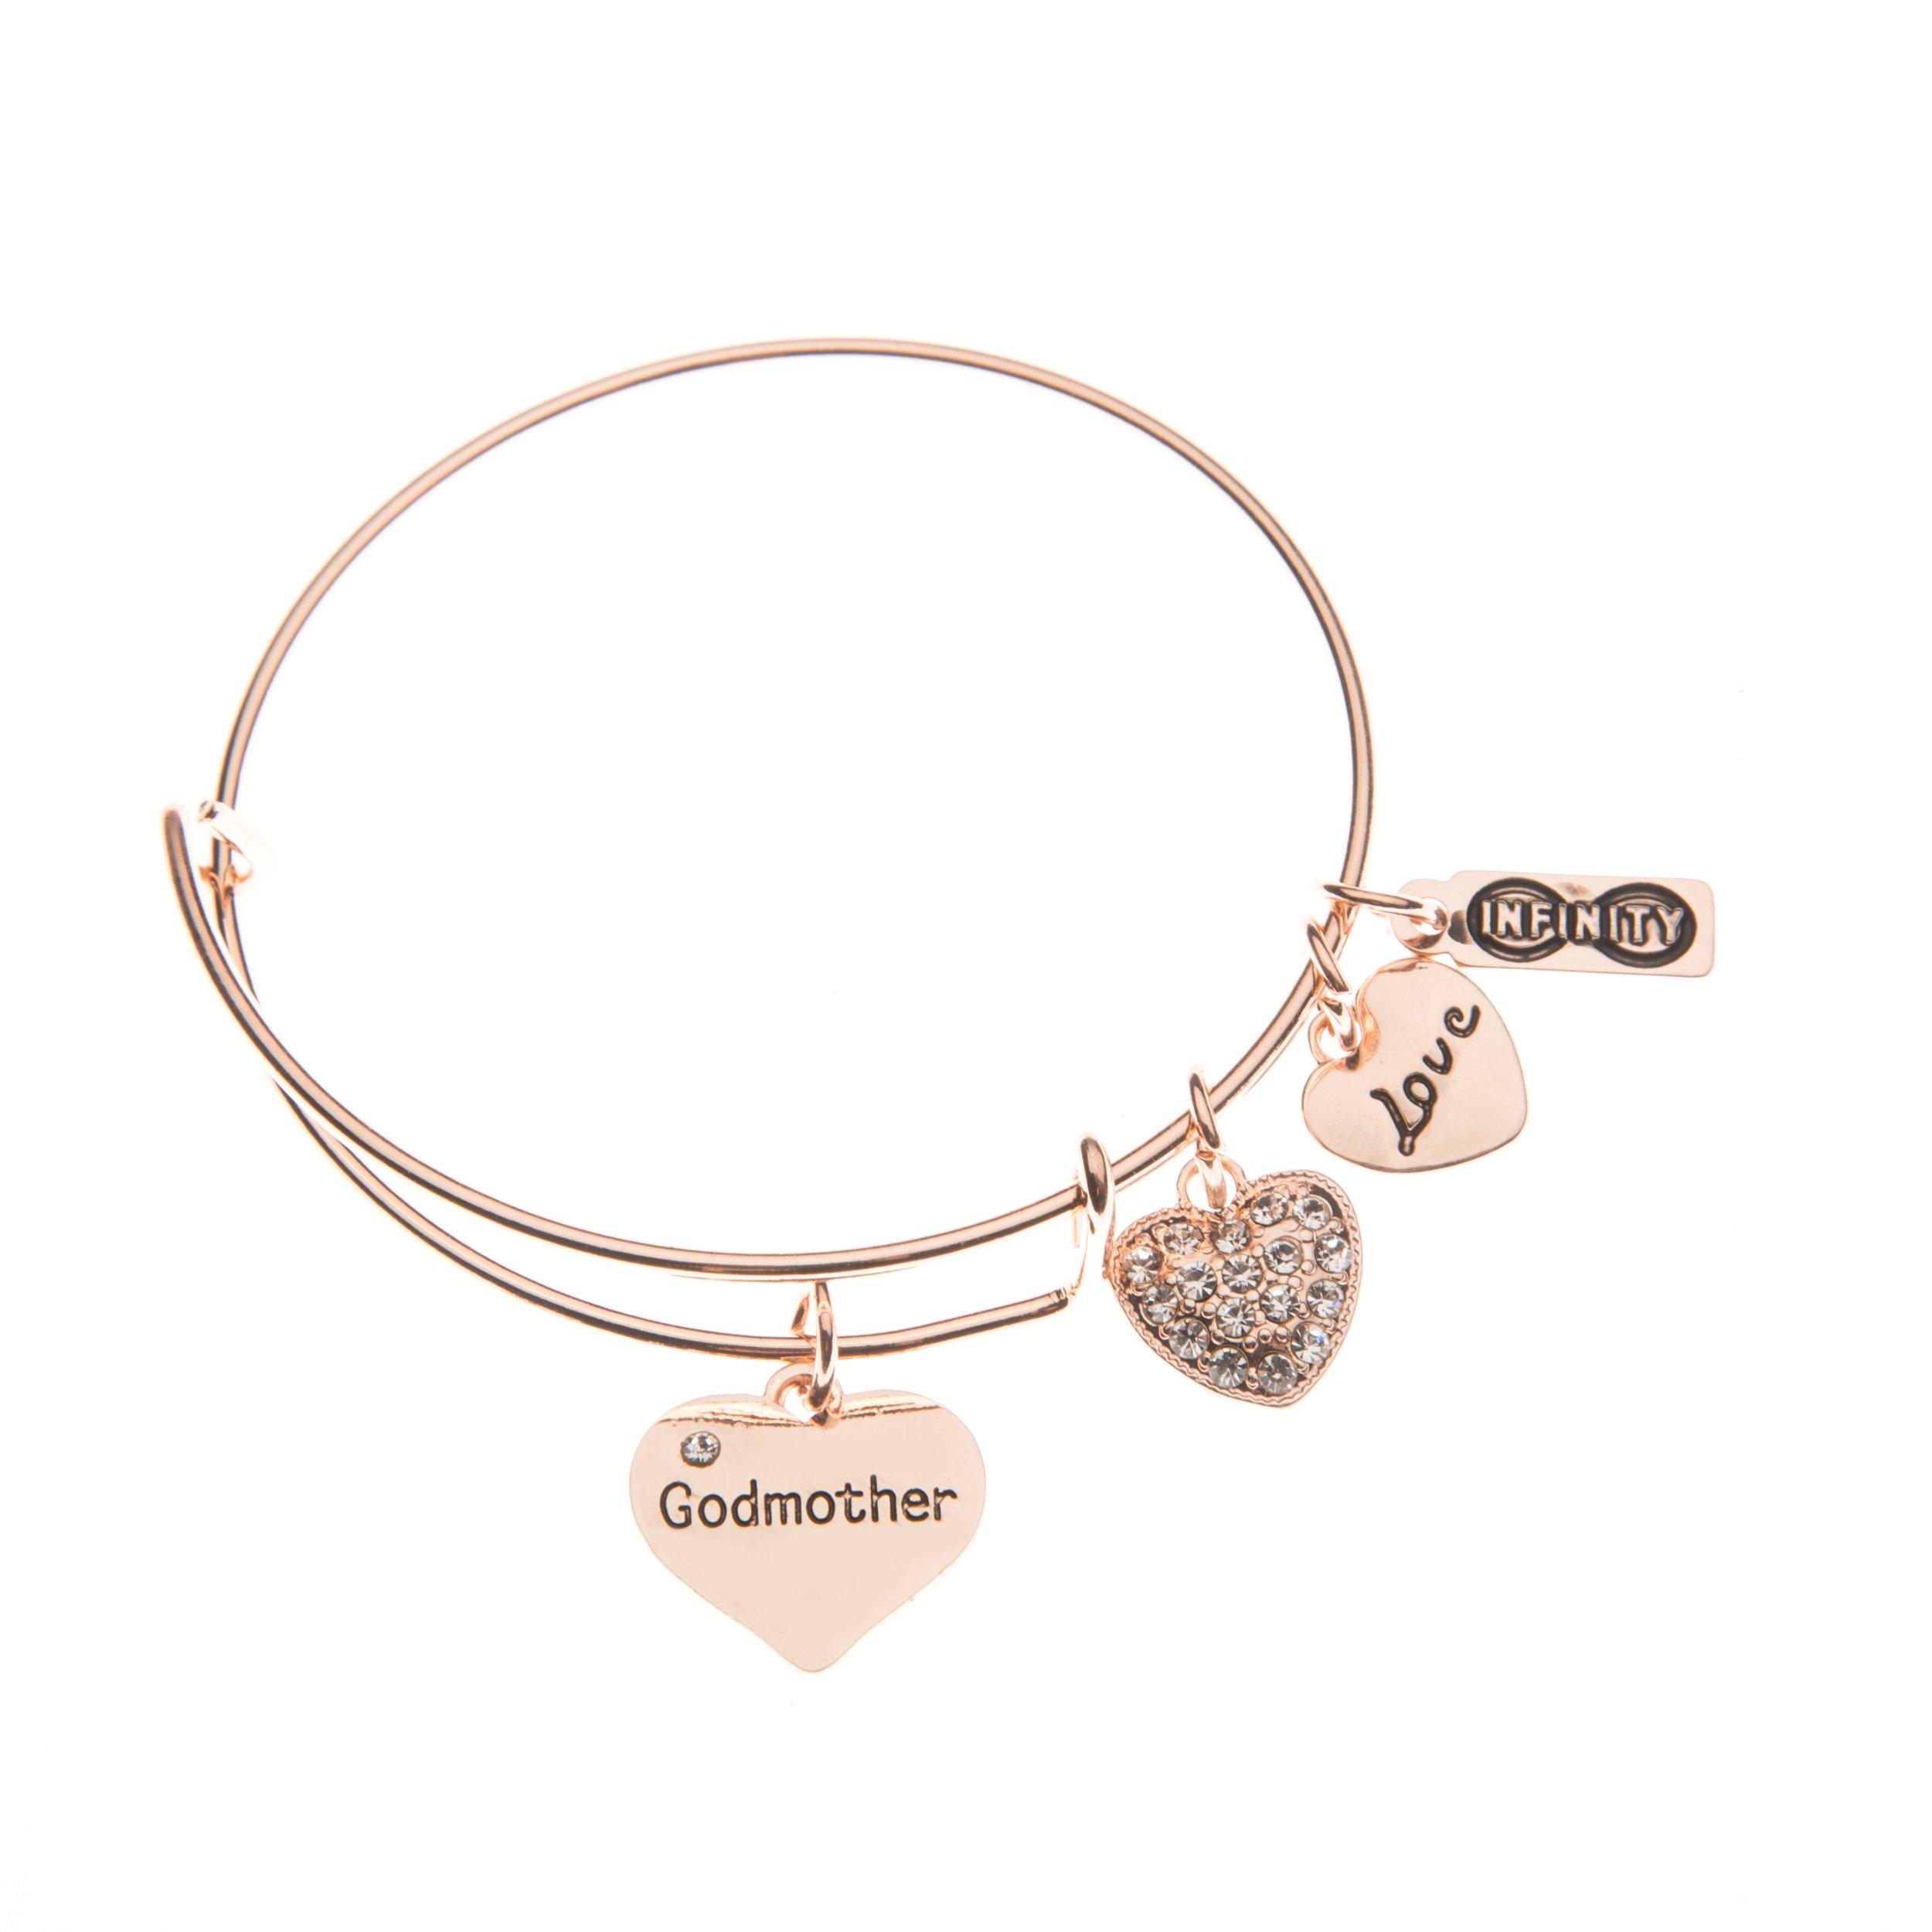 Infinity Collection Godmother Bangle Bracelet- Godmother Gift- Rose Gold Godmother Jewelry from Godchild